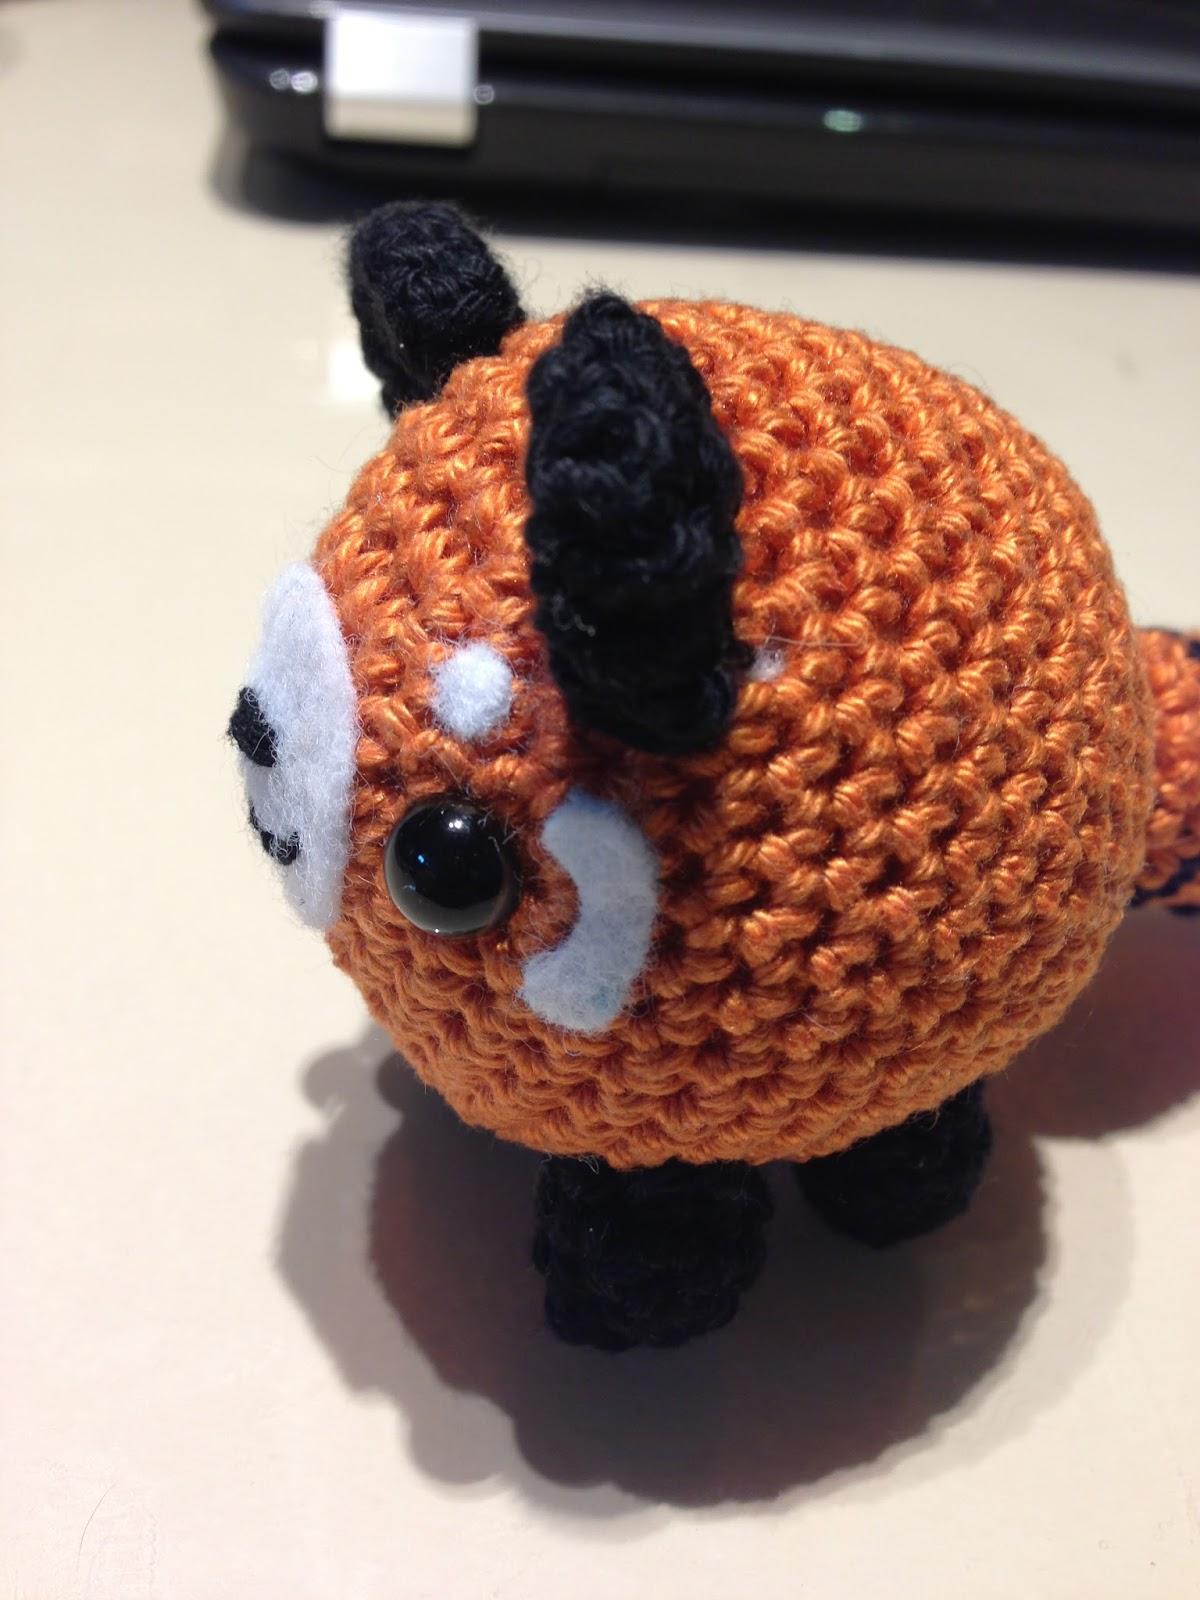 Amigurumi Free Patterns Pokemon : Doni handmade: Red panda amigurumi pattern